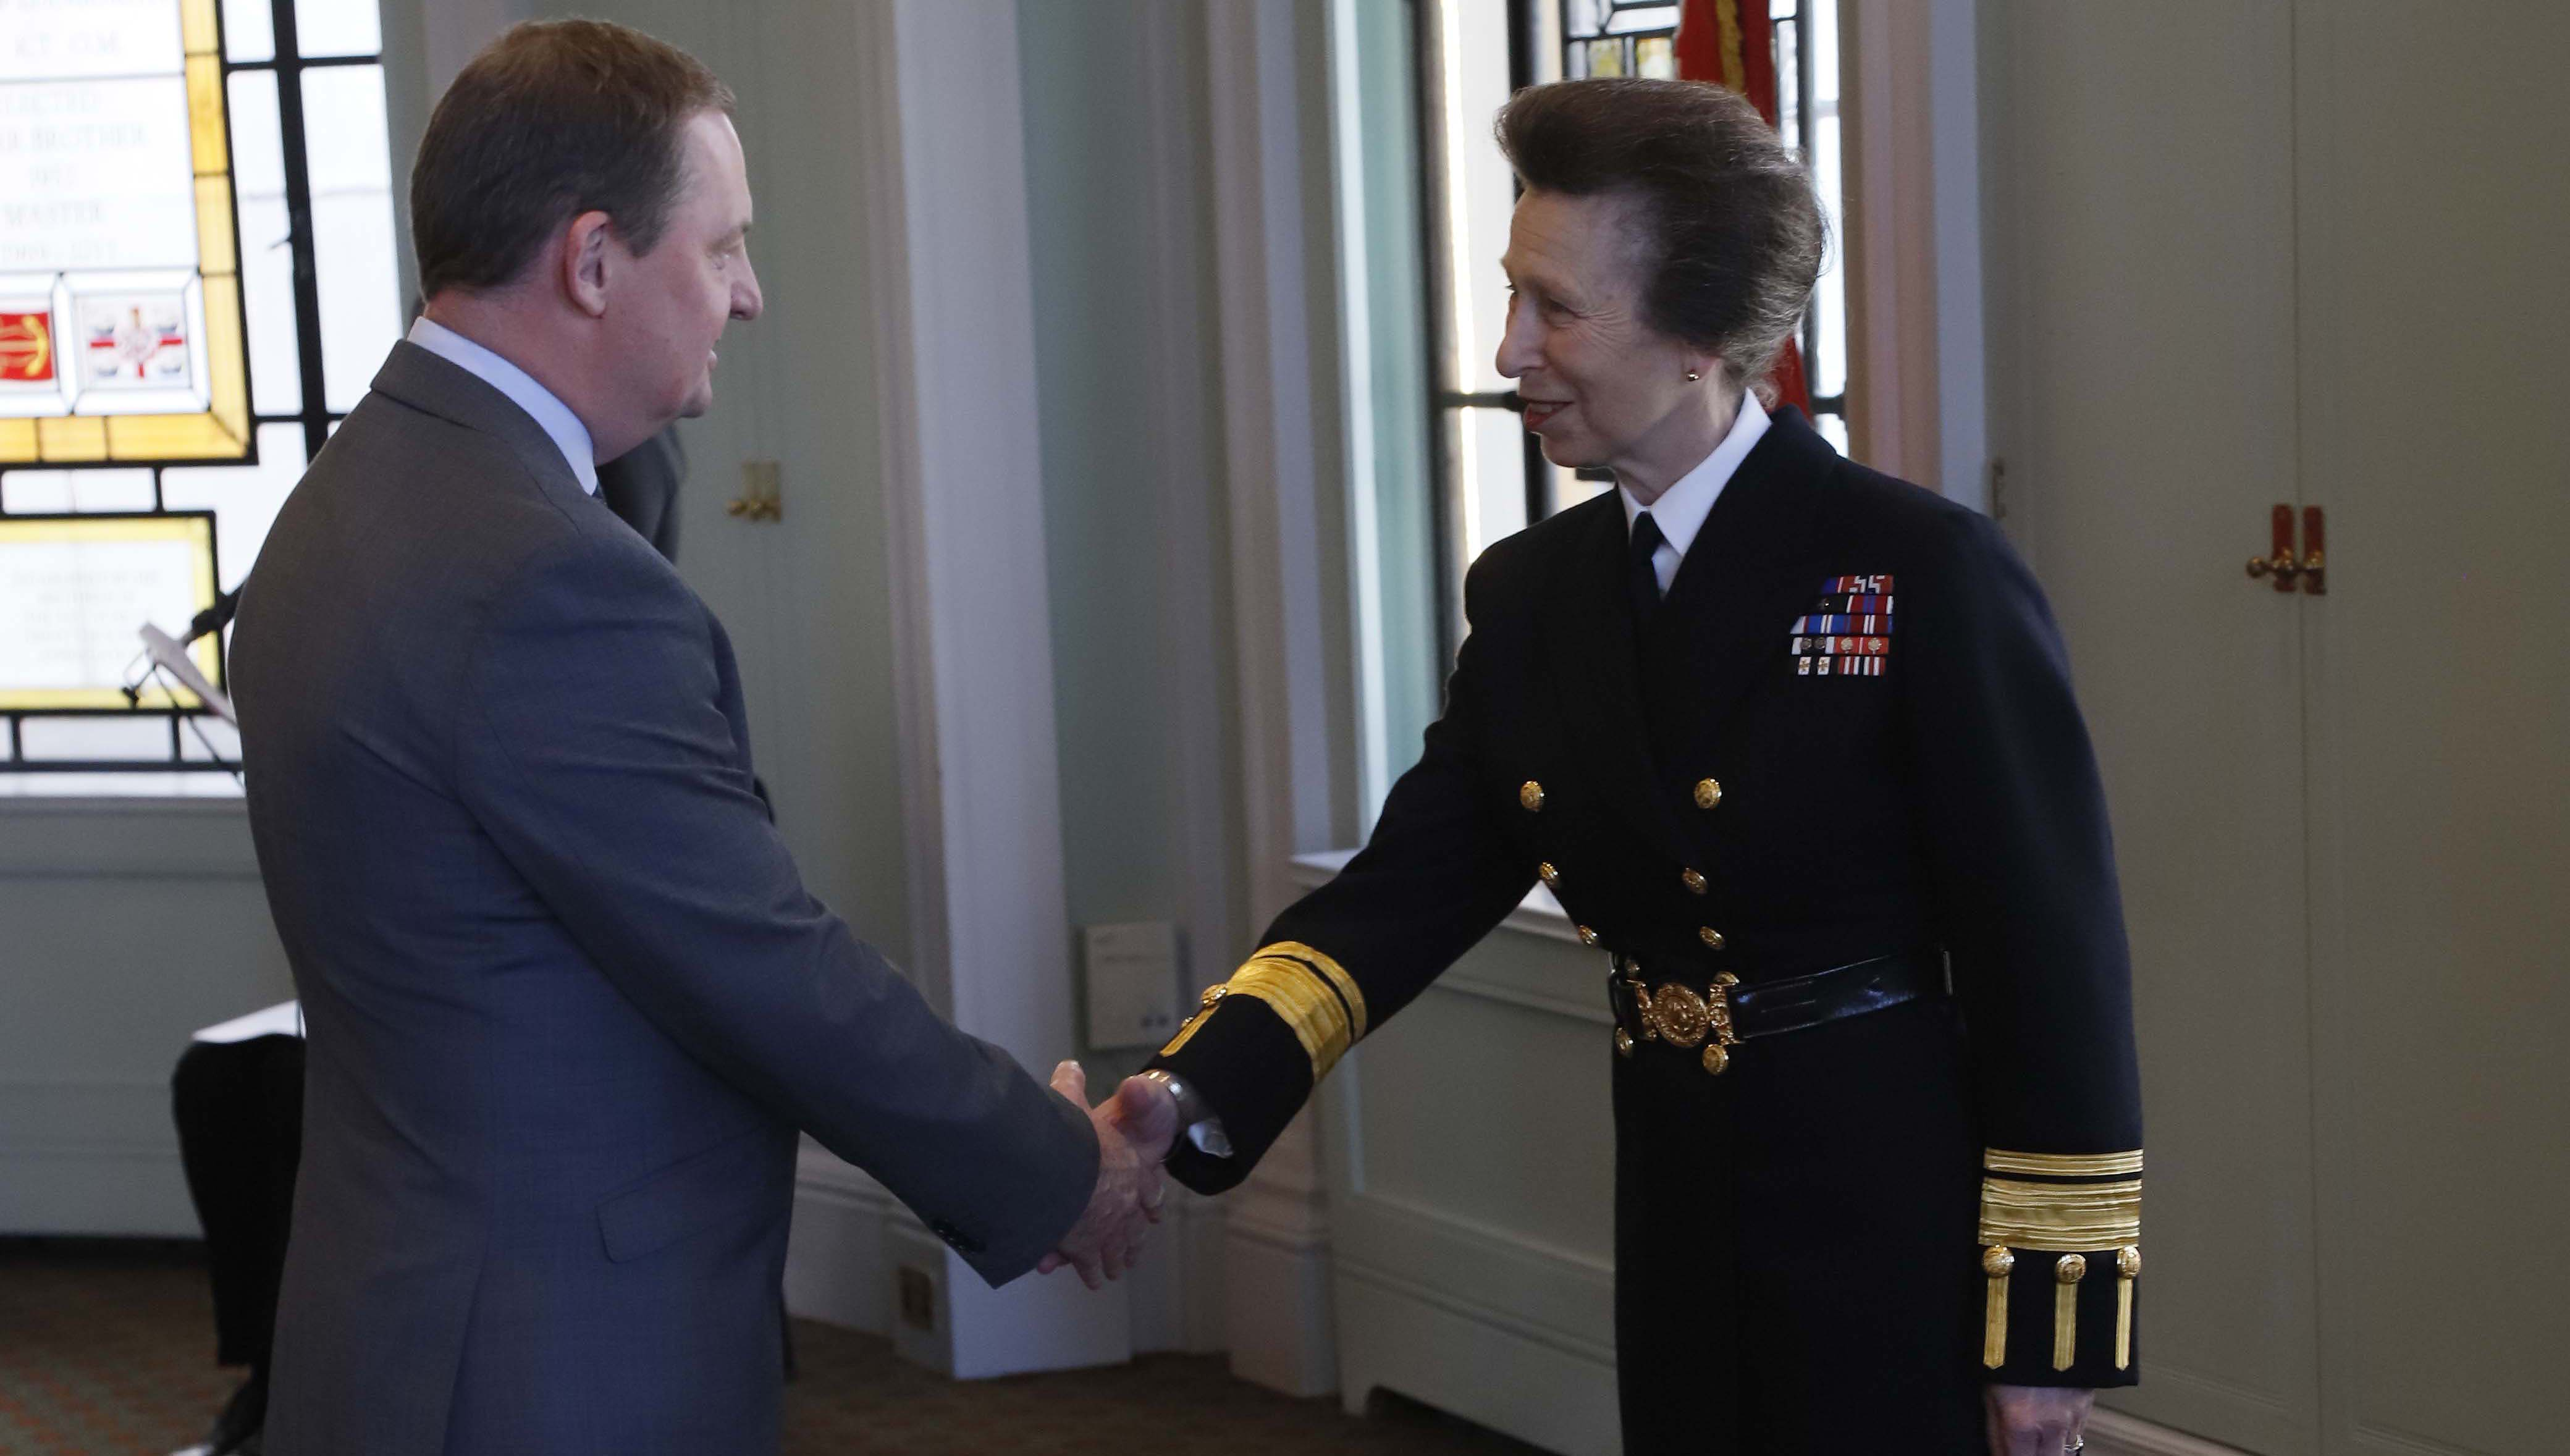 Nautilus general secretary awarded Merchant Navy Medal